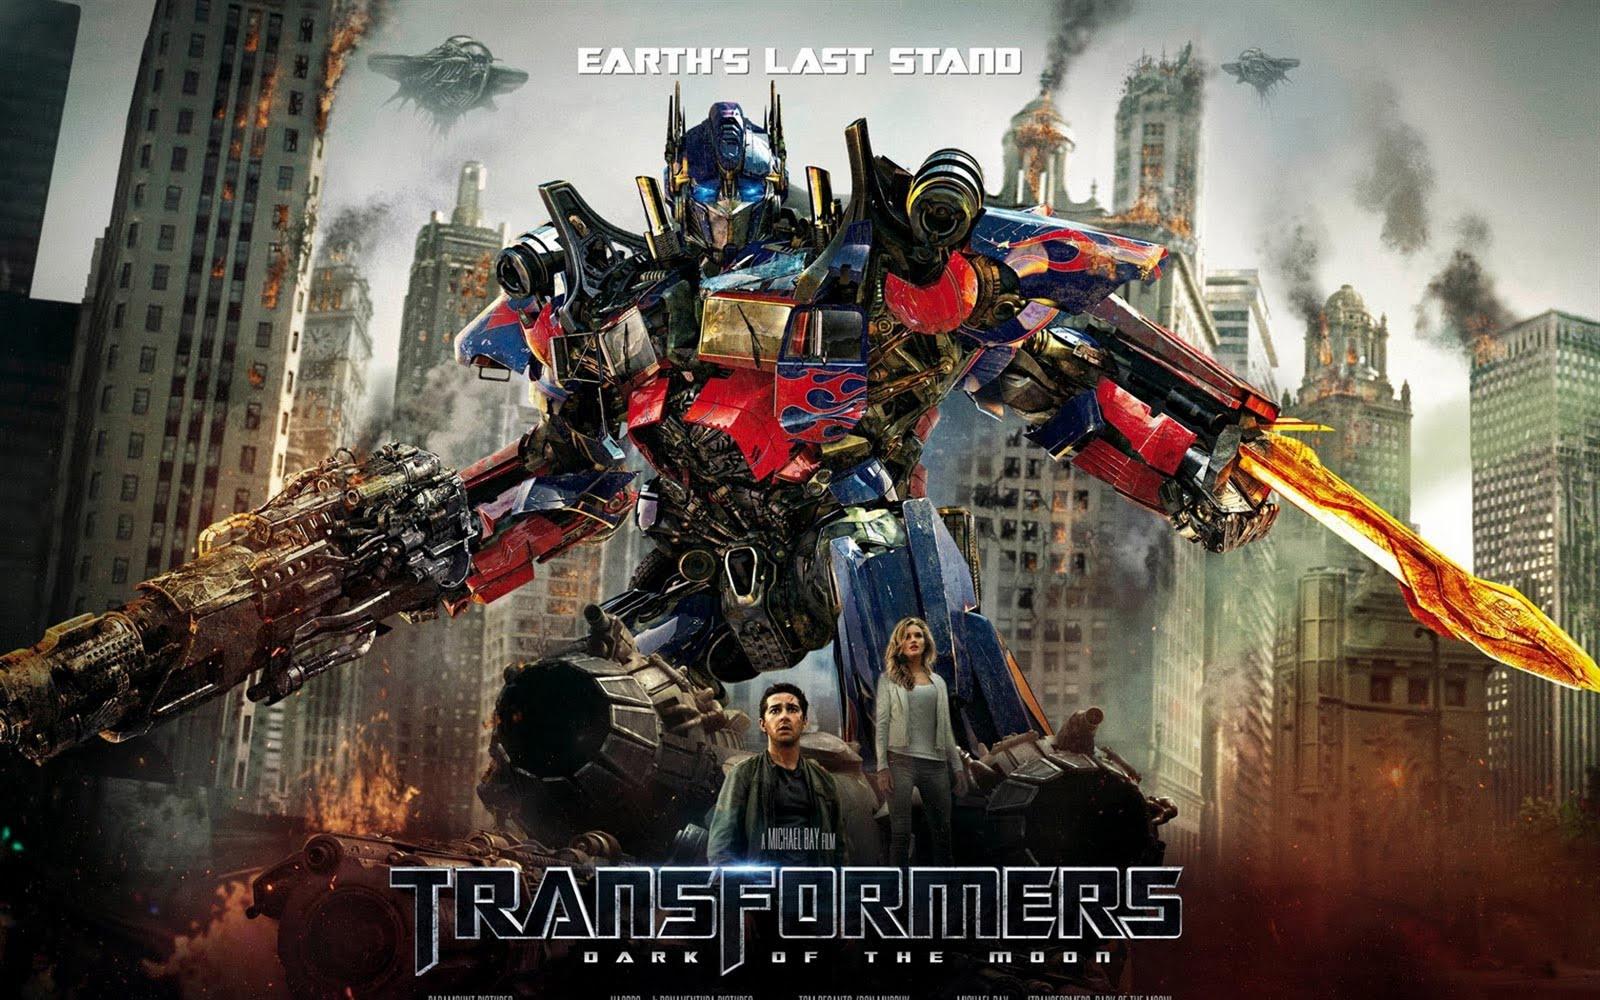 Gus Wallpaper Transformers 3 Dark of The Moon Wallpapers 1600x1000